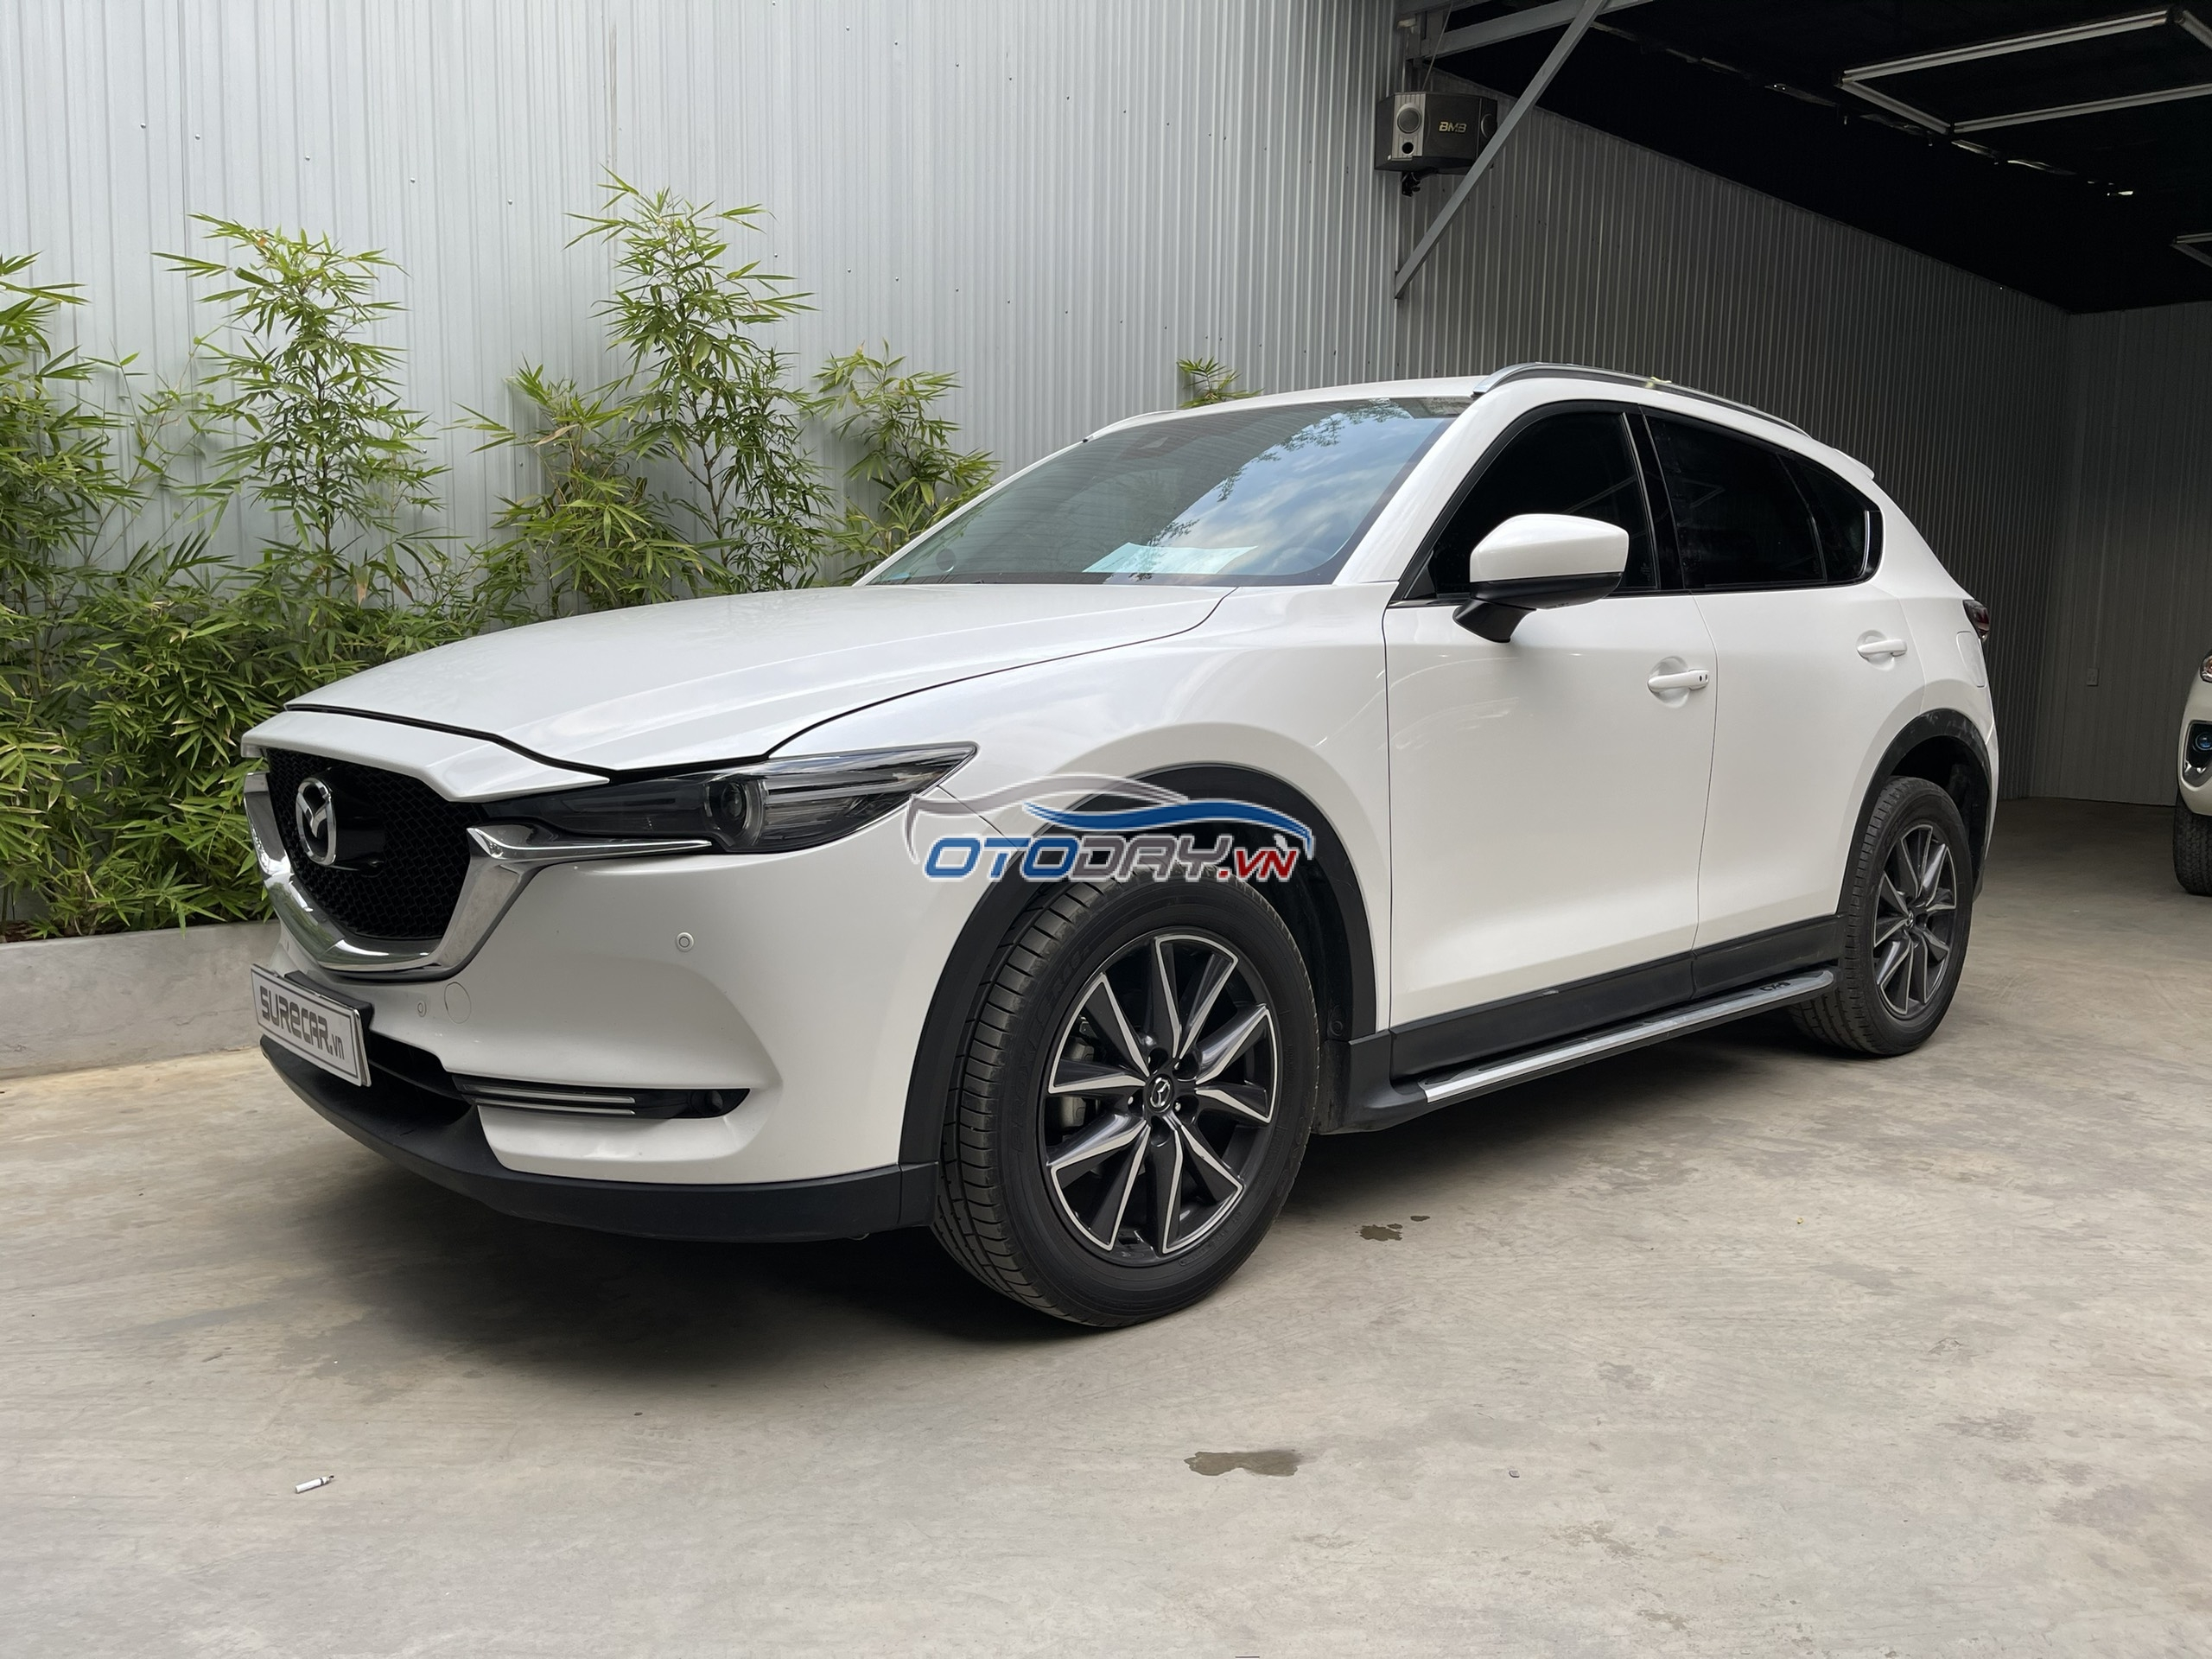 Cần bán Mazda CX-5 2019 Full